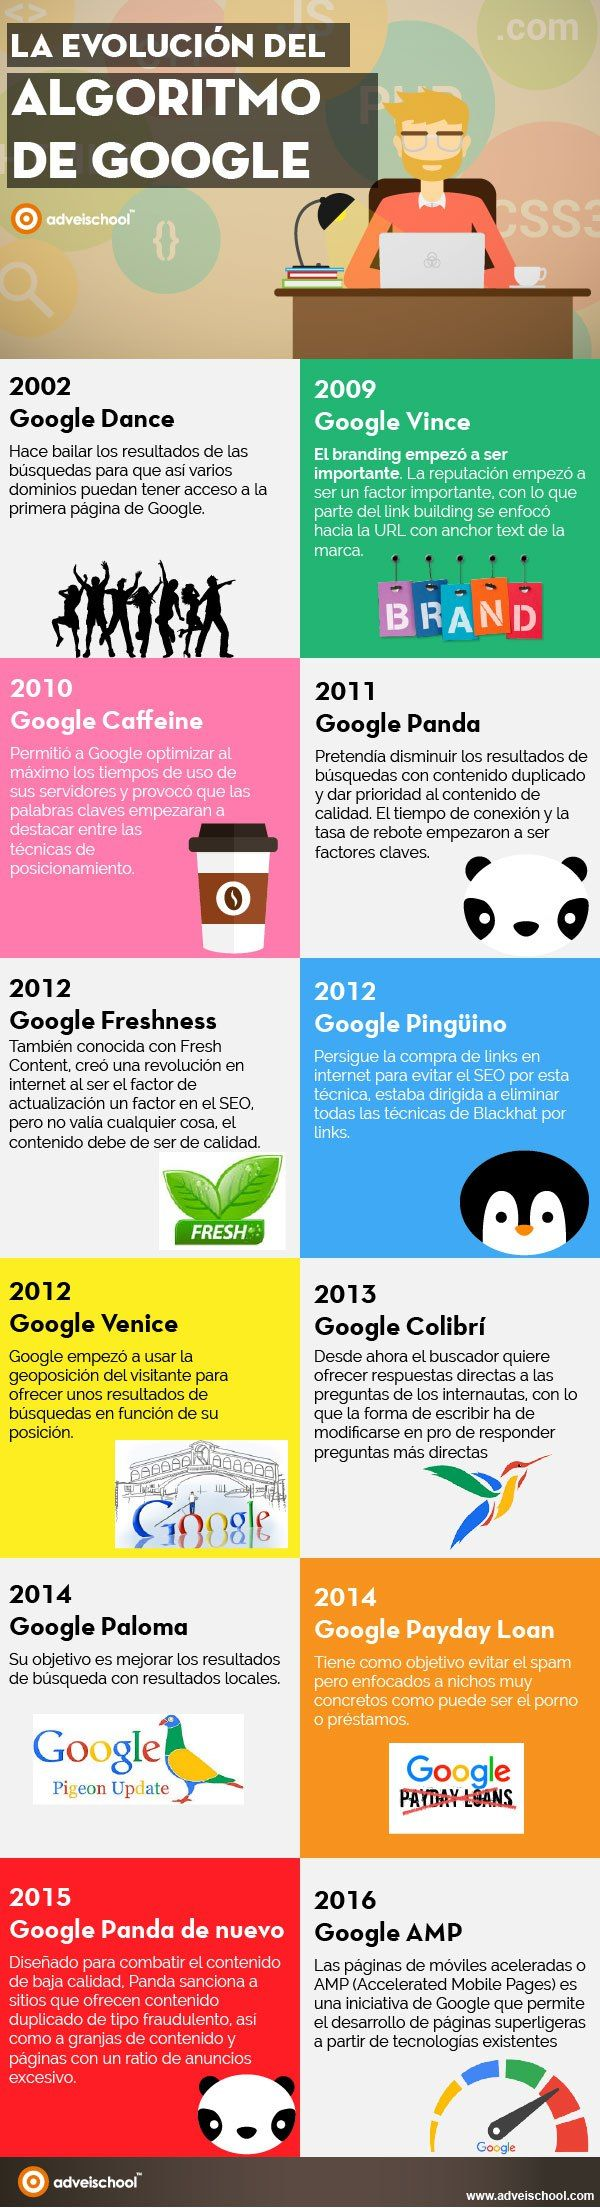 evolucion-algoritmo-de-google-infografia